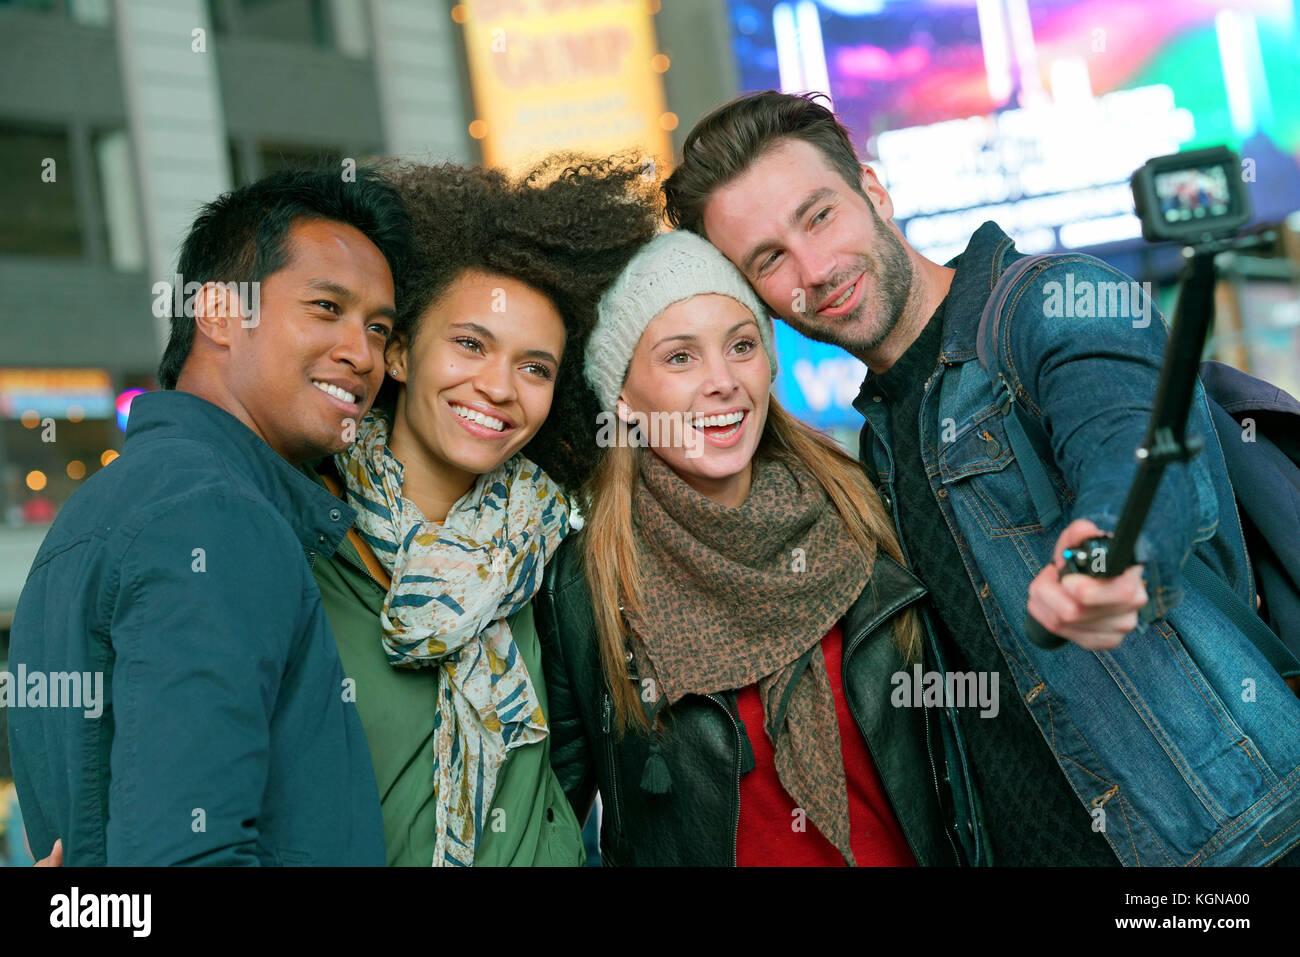 Freunde am Times Square nehmen selfie Bild Stockbild